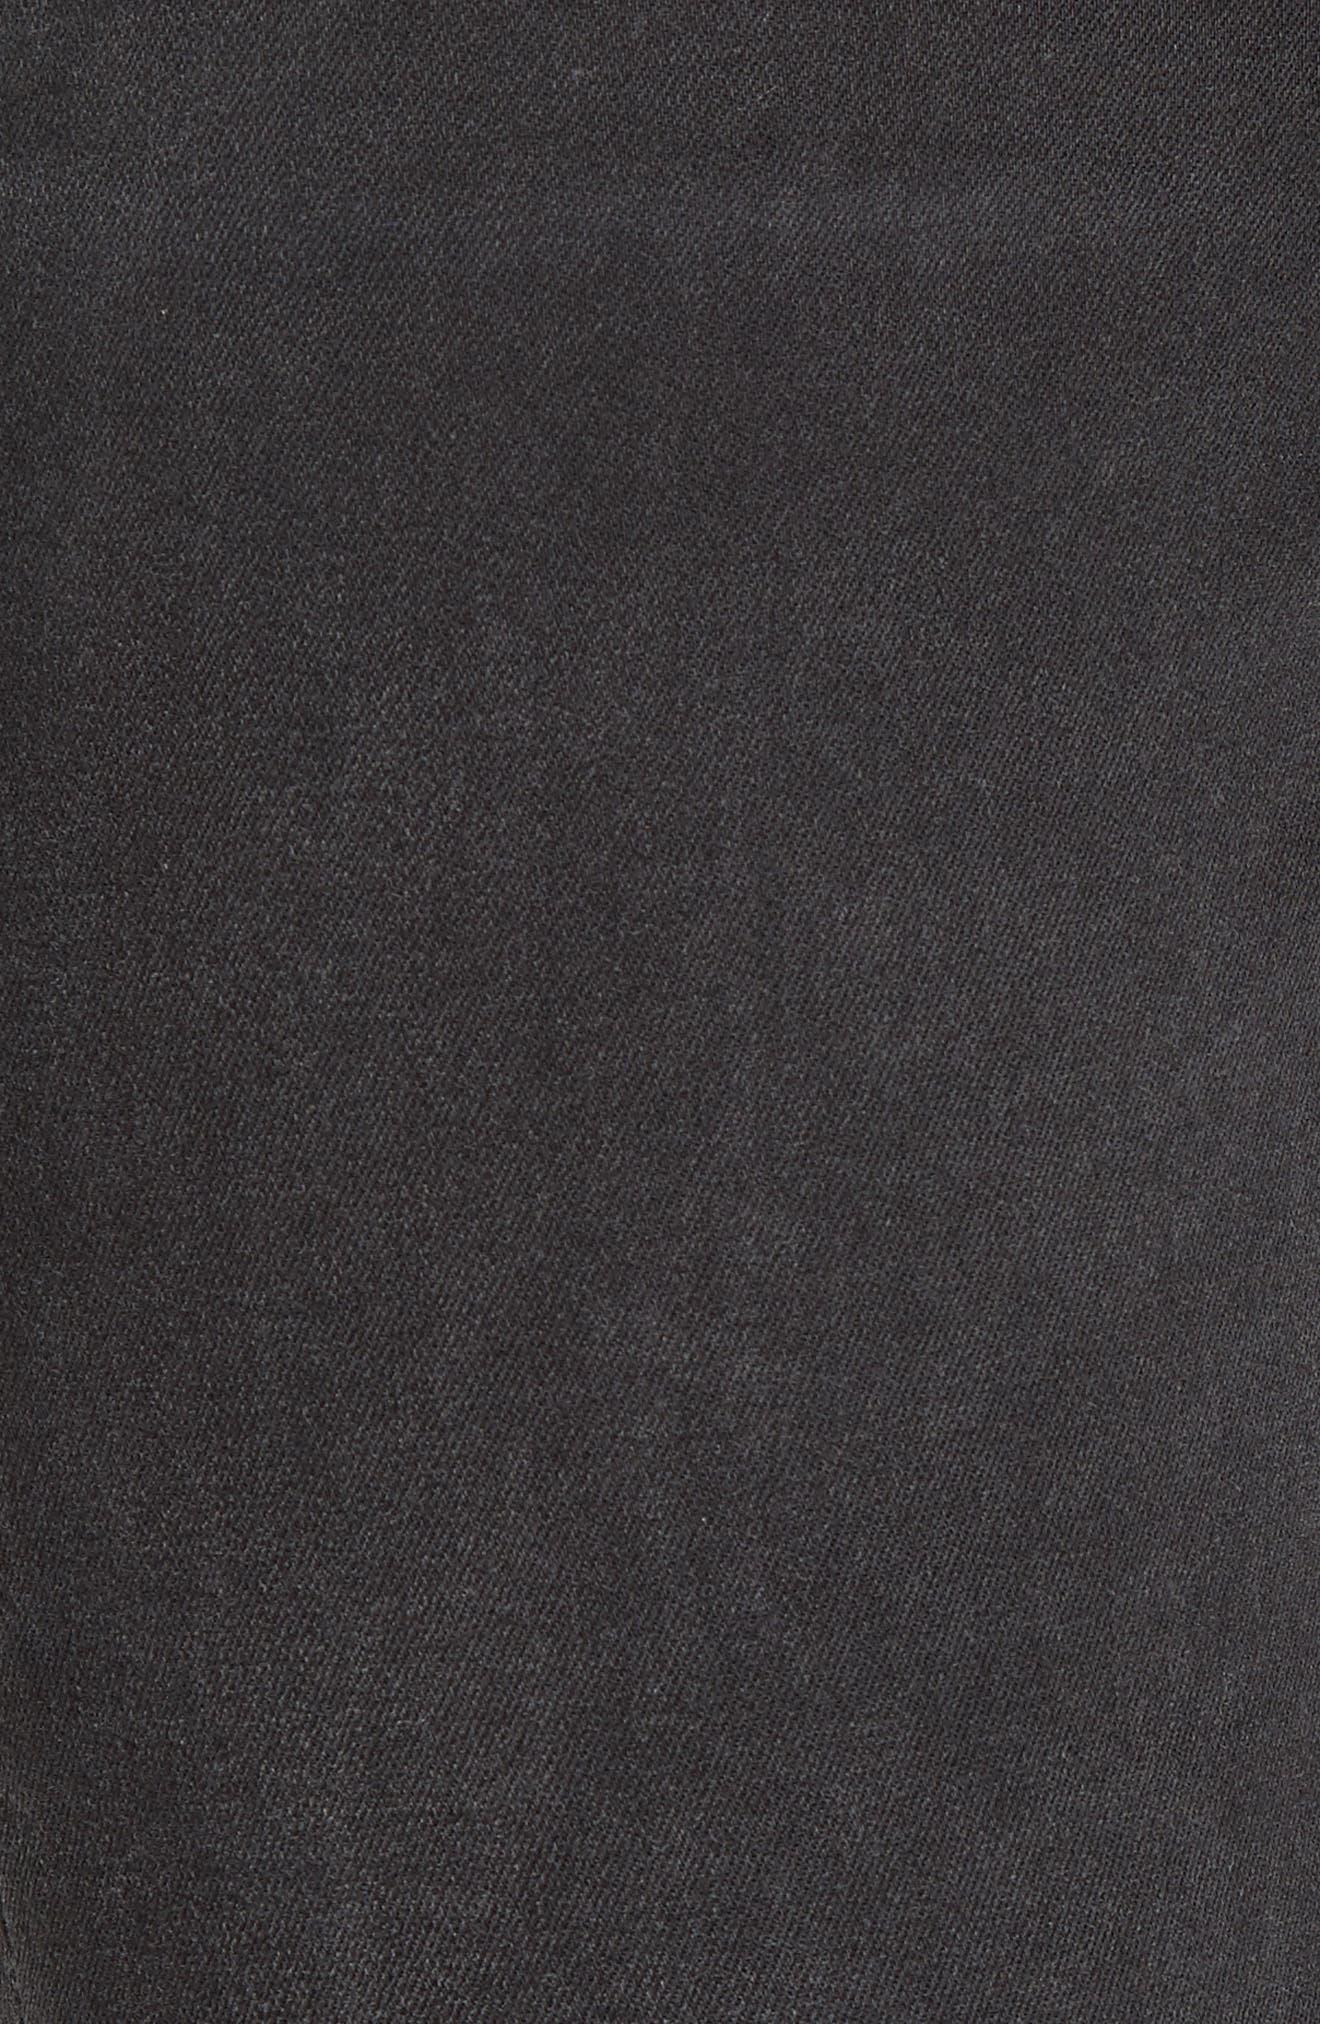 The Skinny Stretch Denim Jeans,                             Alternate thumbnail 5, color,                             001